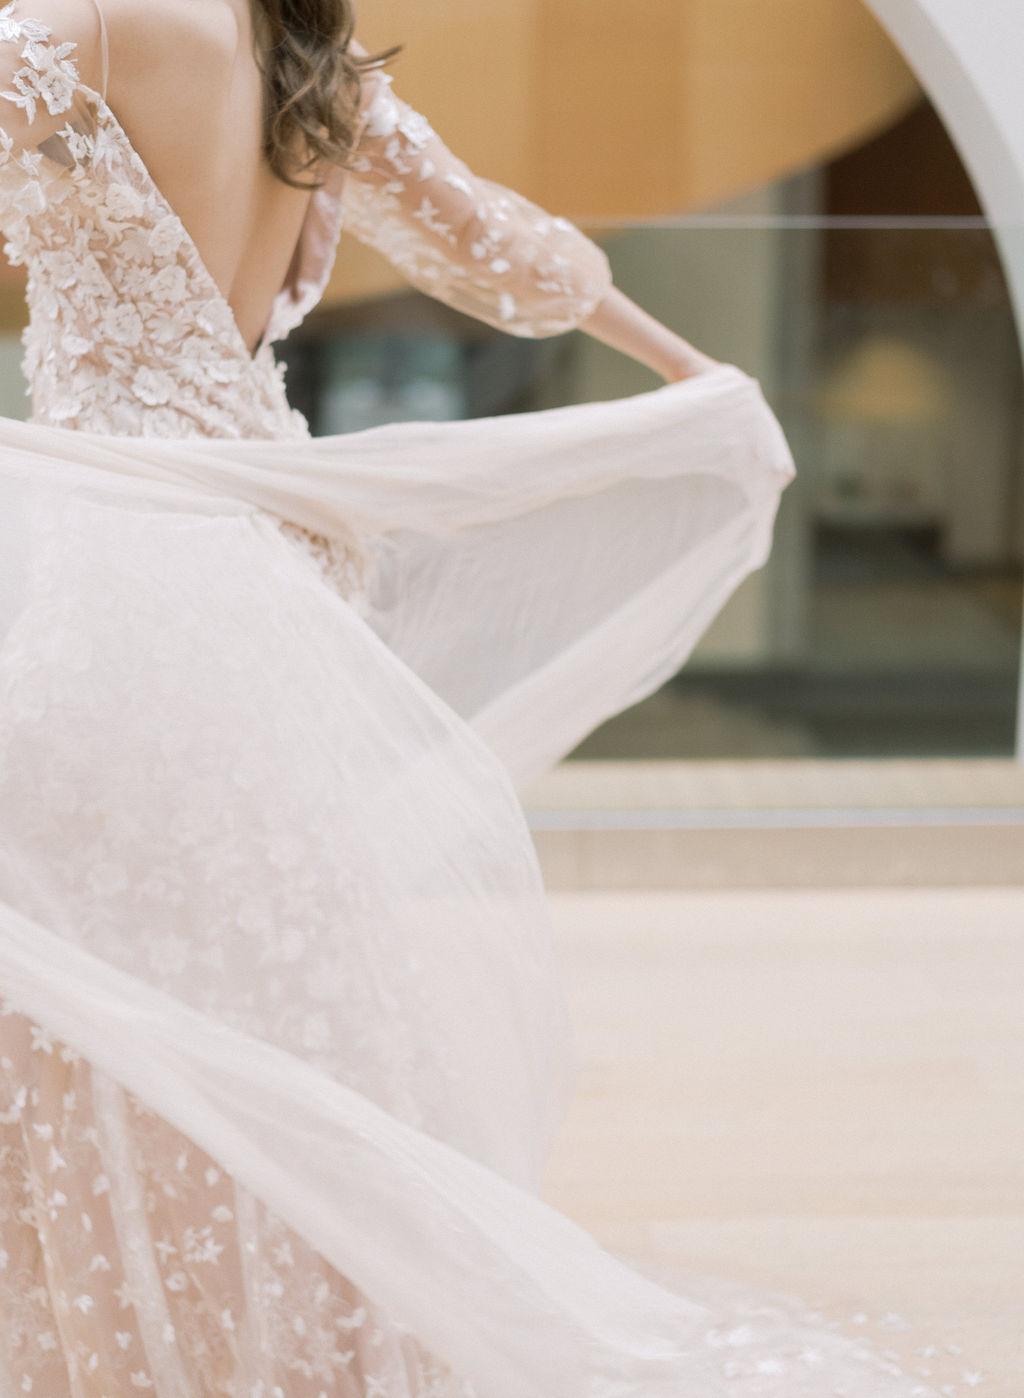 artiese-ago-wedding-editorial-06776.jpg